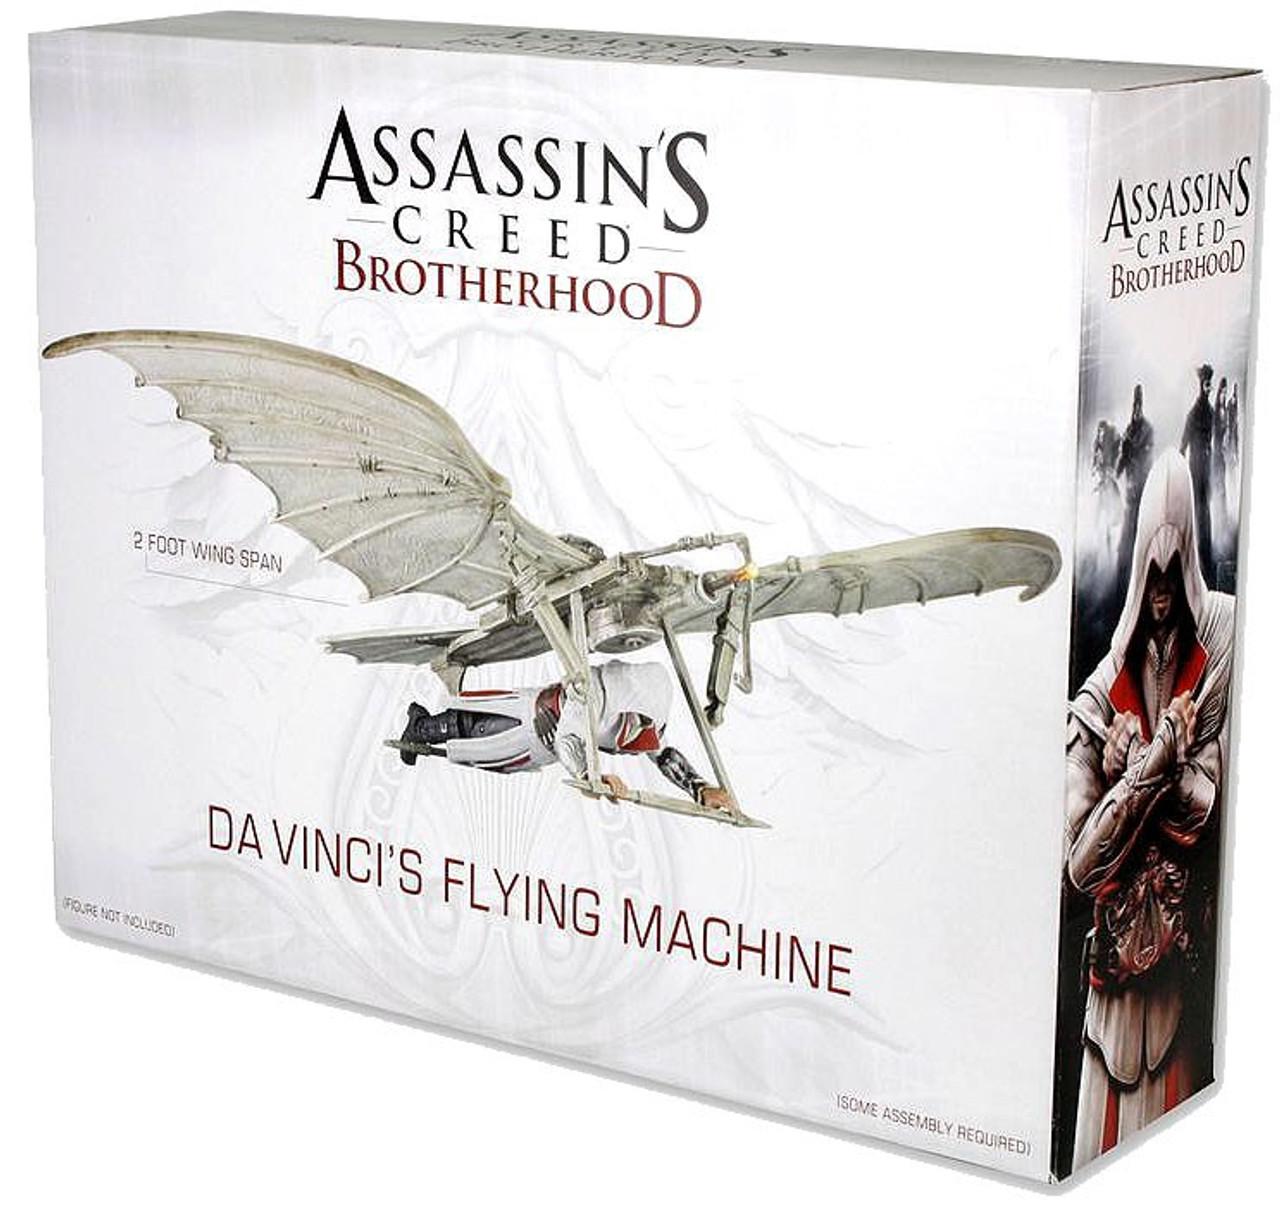 NECA Assassin's Creed Brotherhood Davinci's Flying Machine Exclusive Action Figure Vehicle